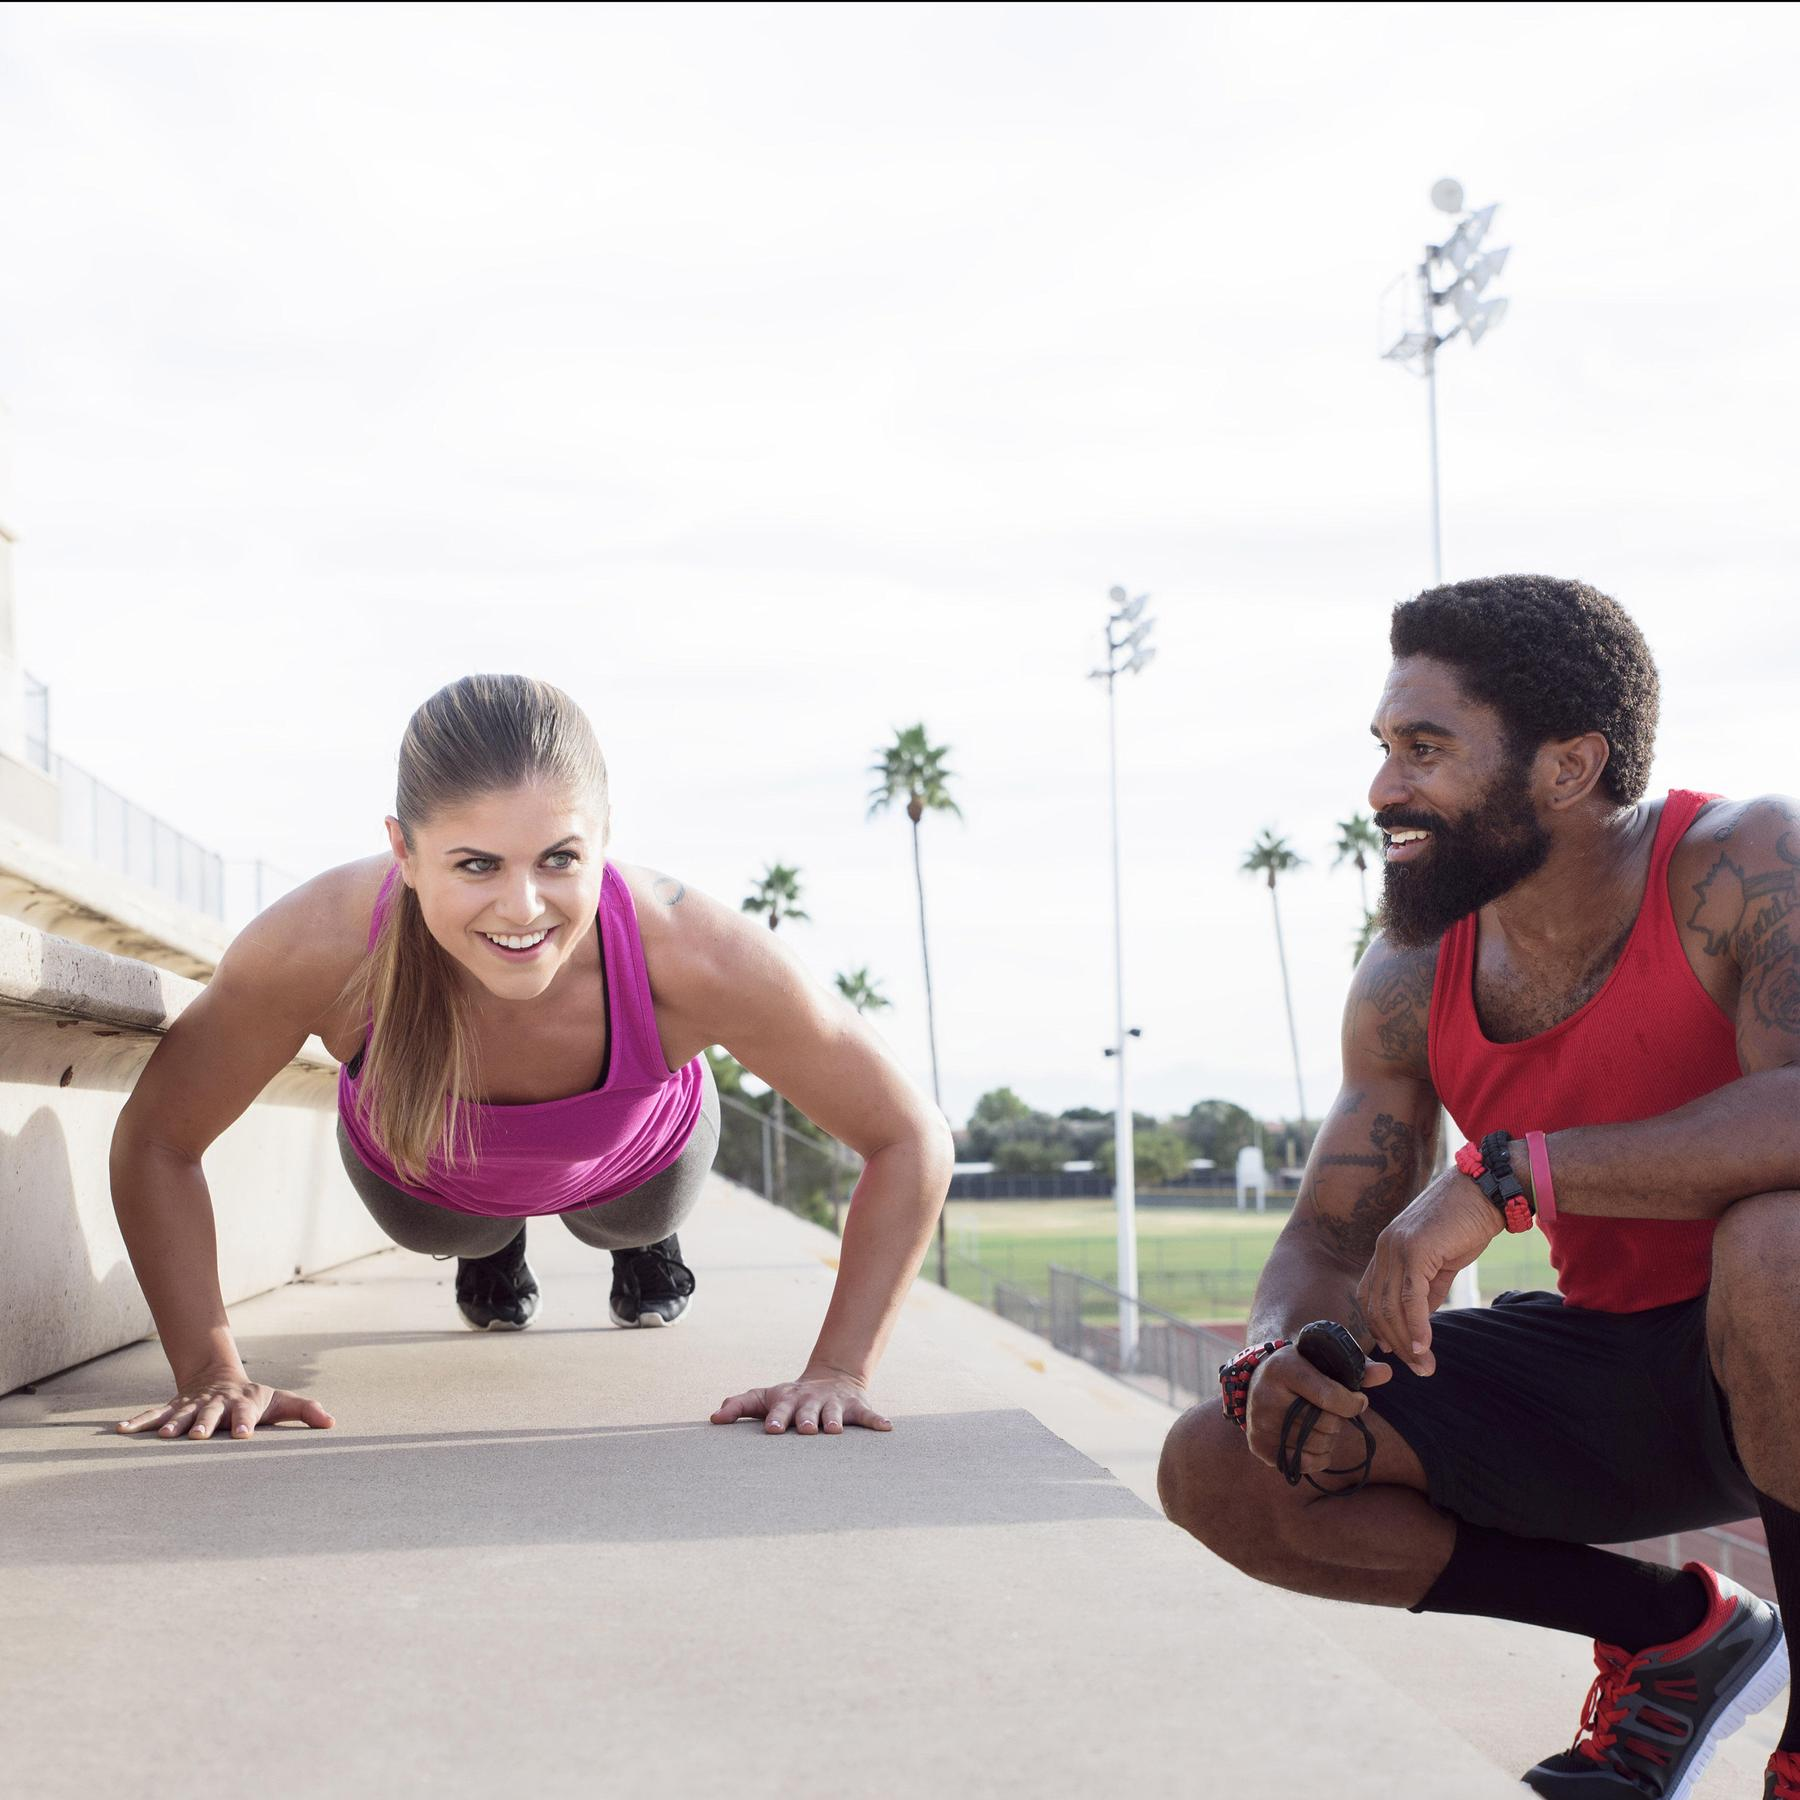 Sportpsychologie - Was bringt mentales Training